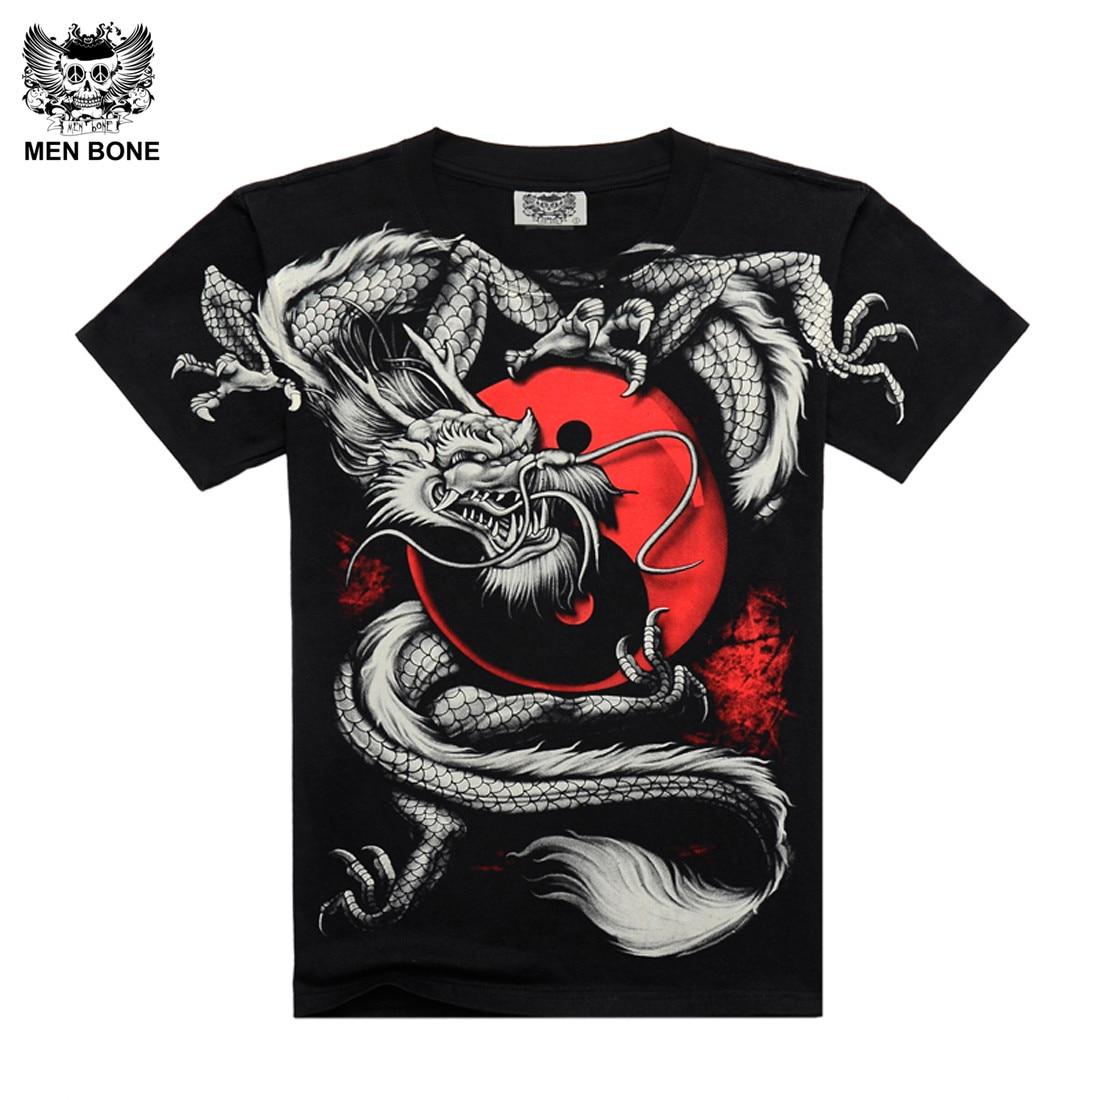 [Men bone] China Tai Chi T-shirt Dragon Rock katoenen heren Tshirt Zwart korte mouw Zwart Print Heavy Metal Stijl mouw